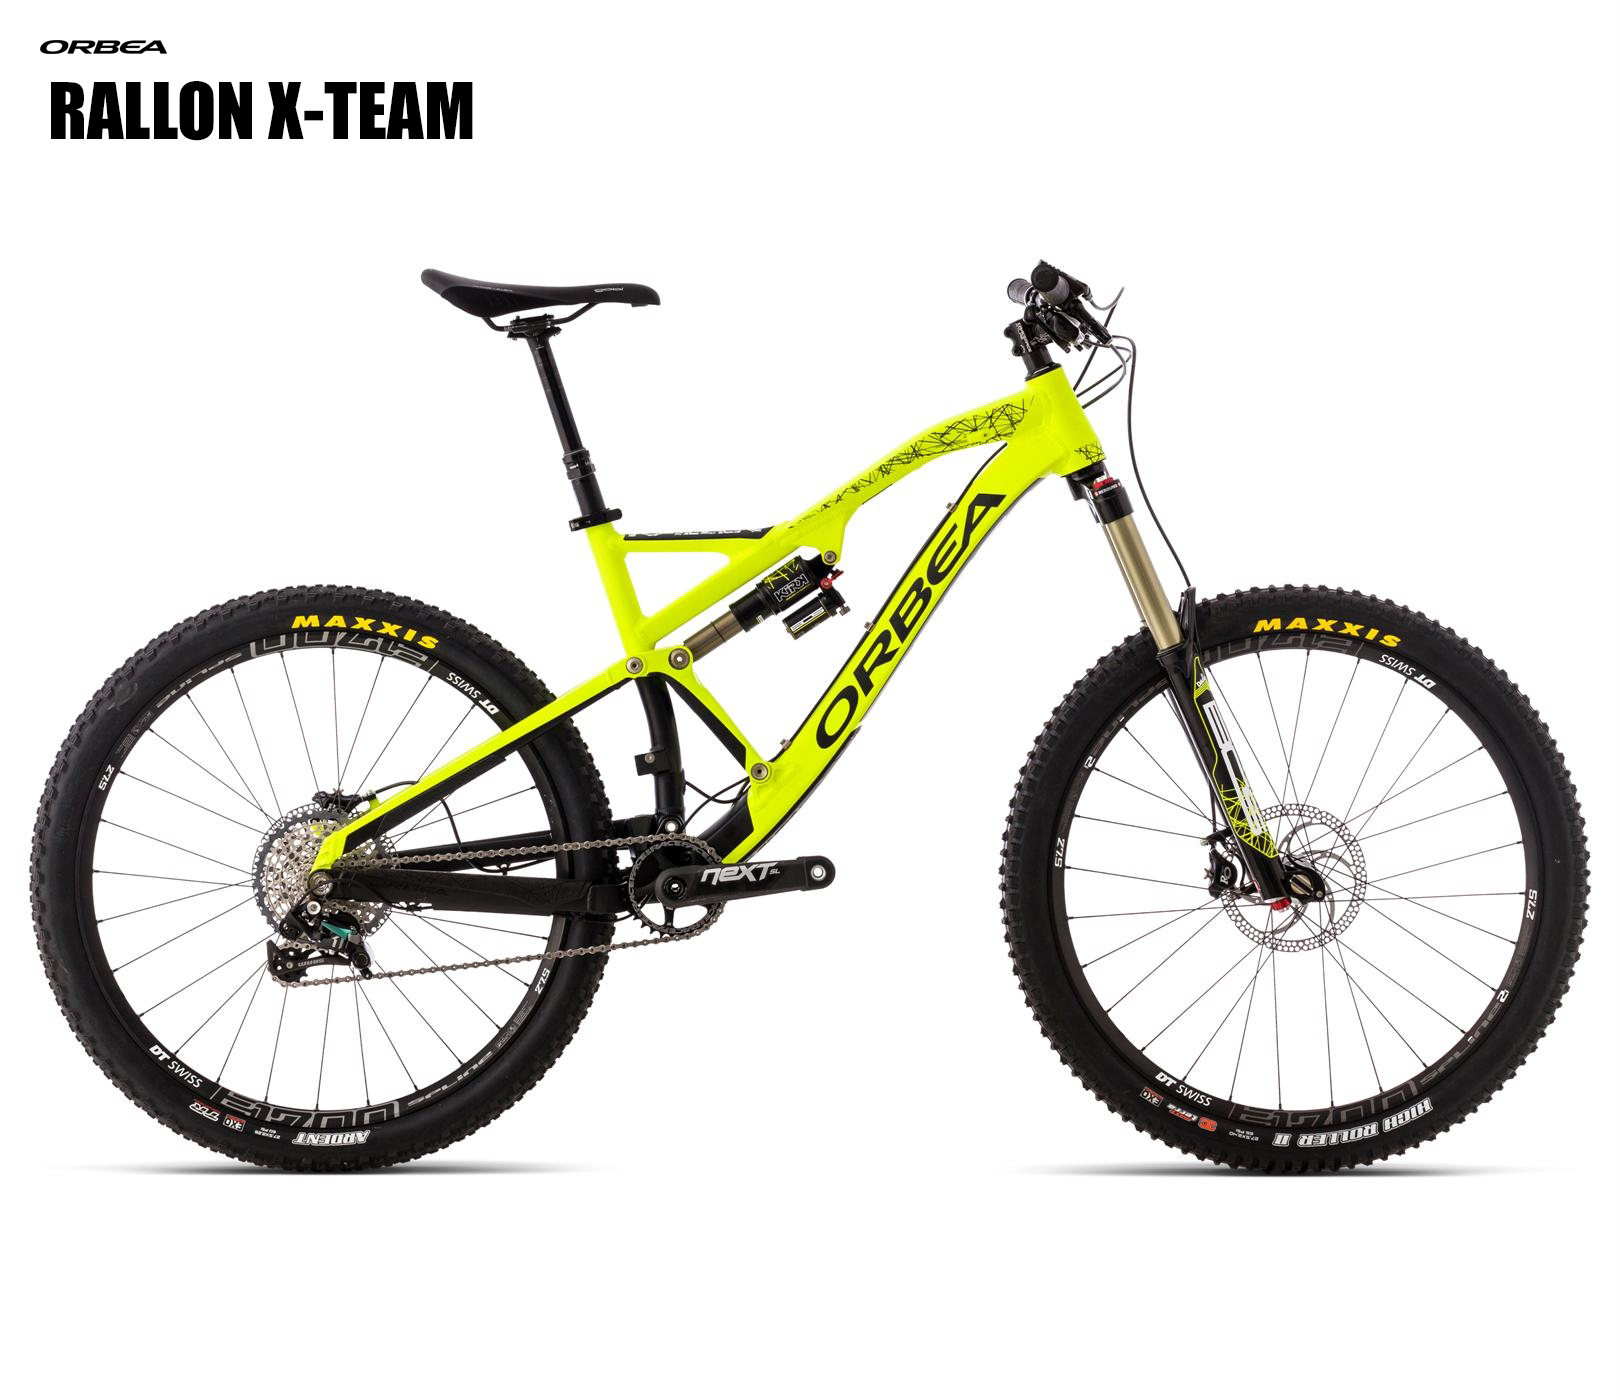 D254TTCC-G1-SIDE-RALLON X-TEAM